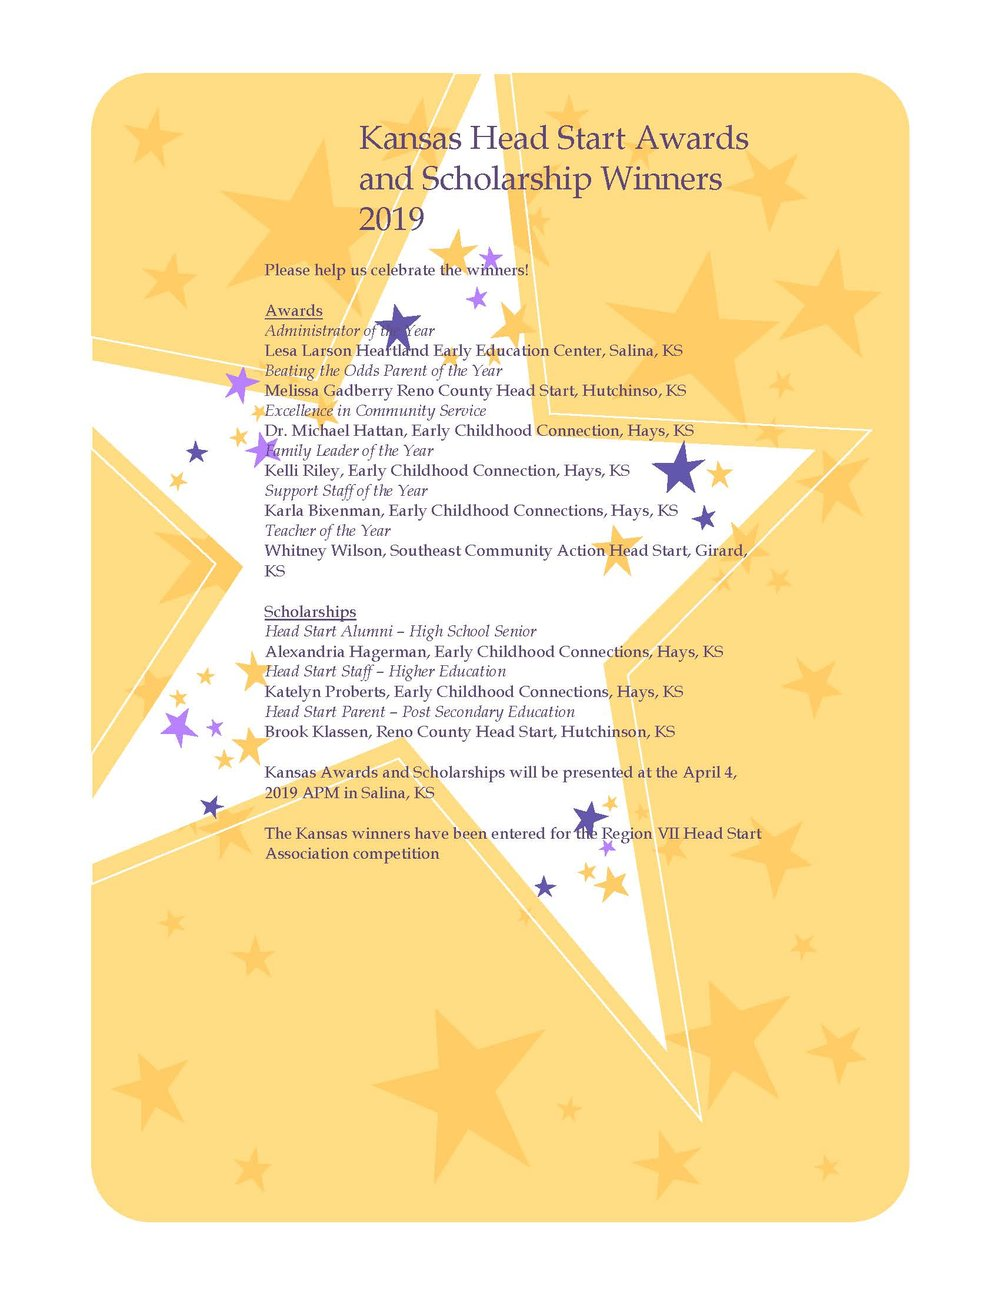 Kansas Head Start Awards and Scholarship Winners 2019.jpg